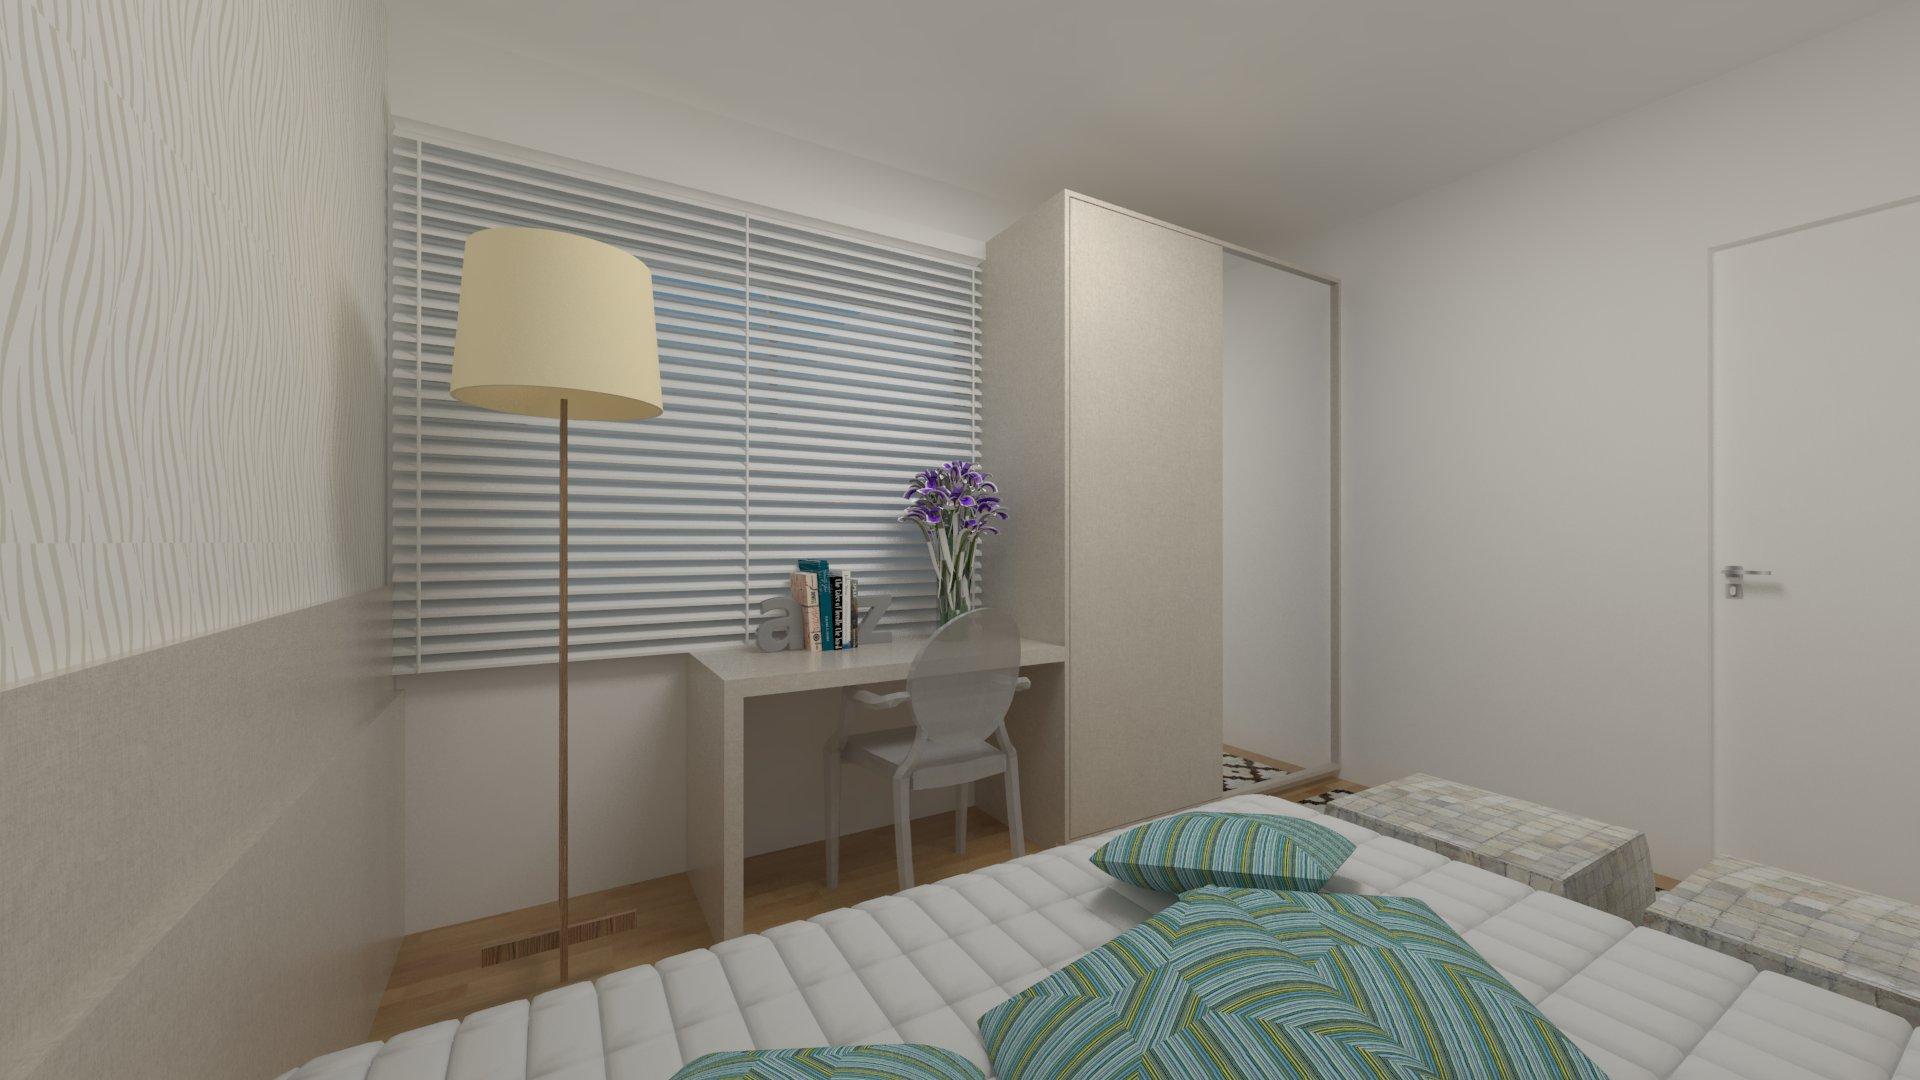 Ap dormitorio hospedes 02.1